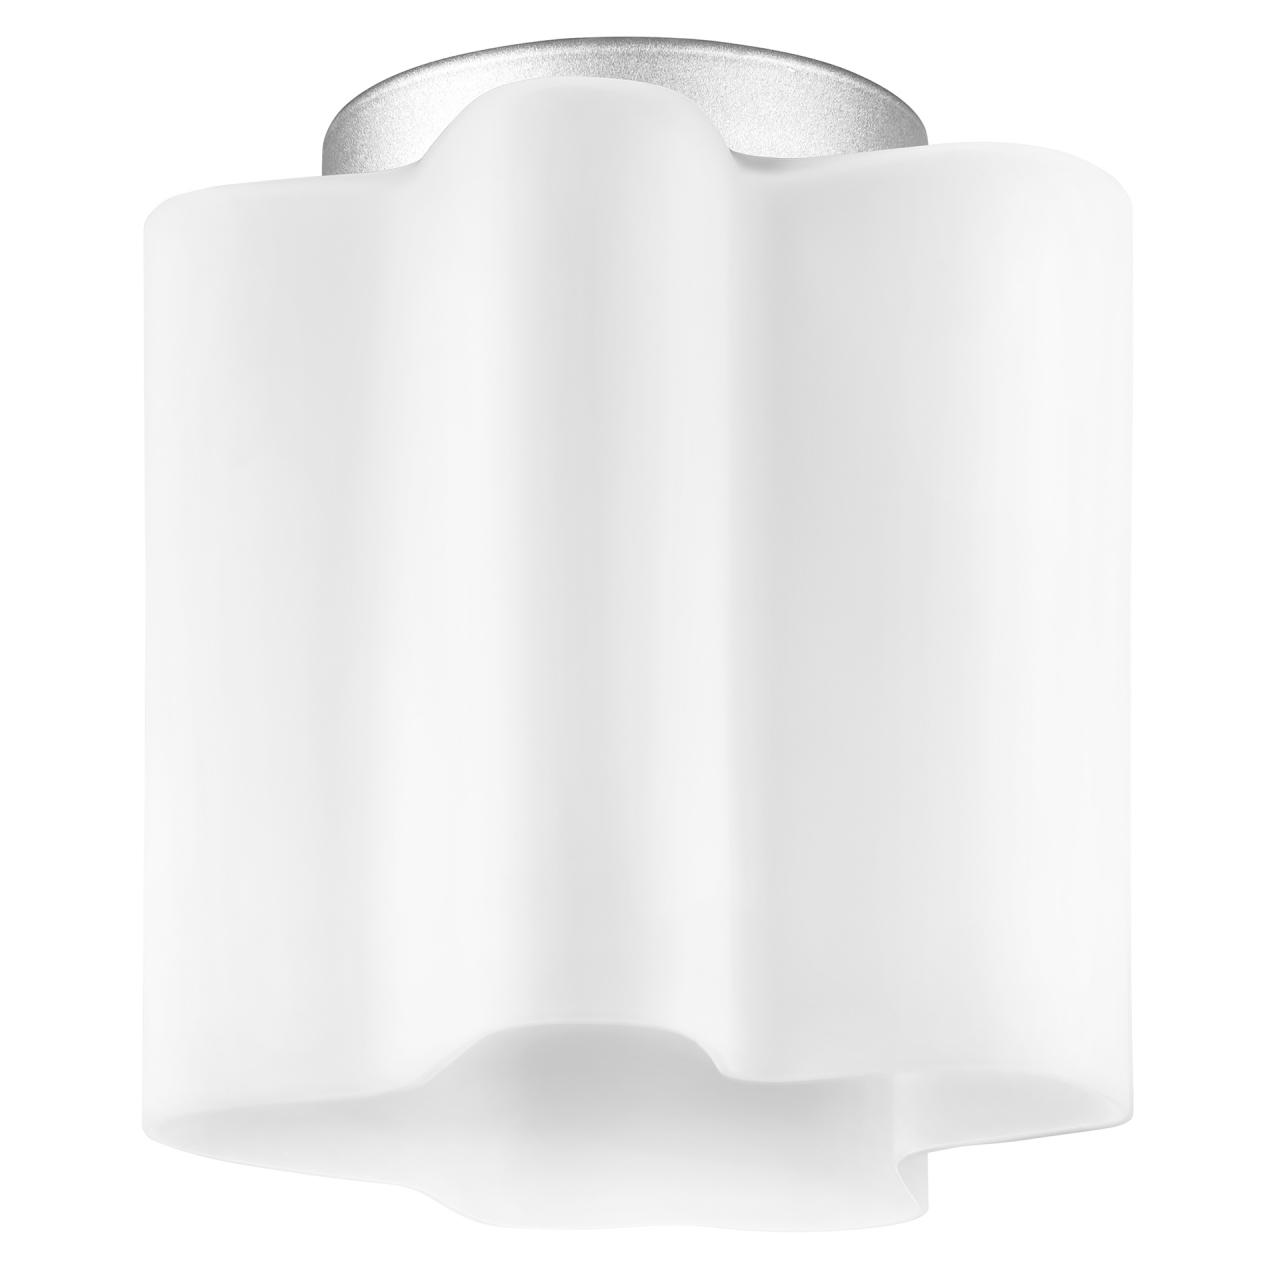 Люстра потолочная Nubi 1х40W E27 хром / белый Lightstar 802010